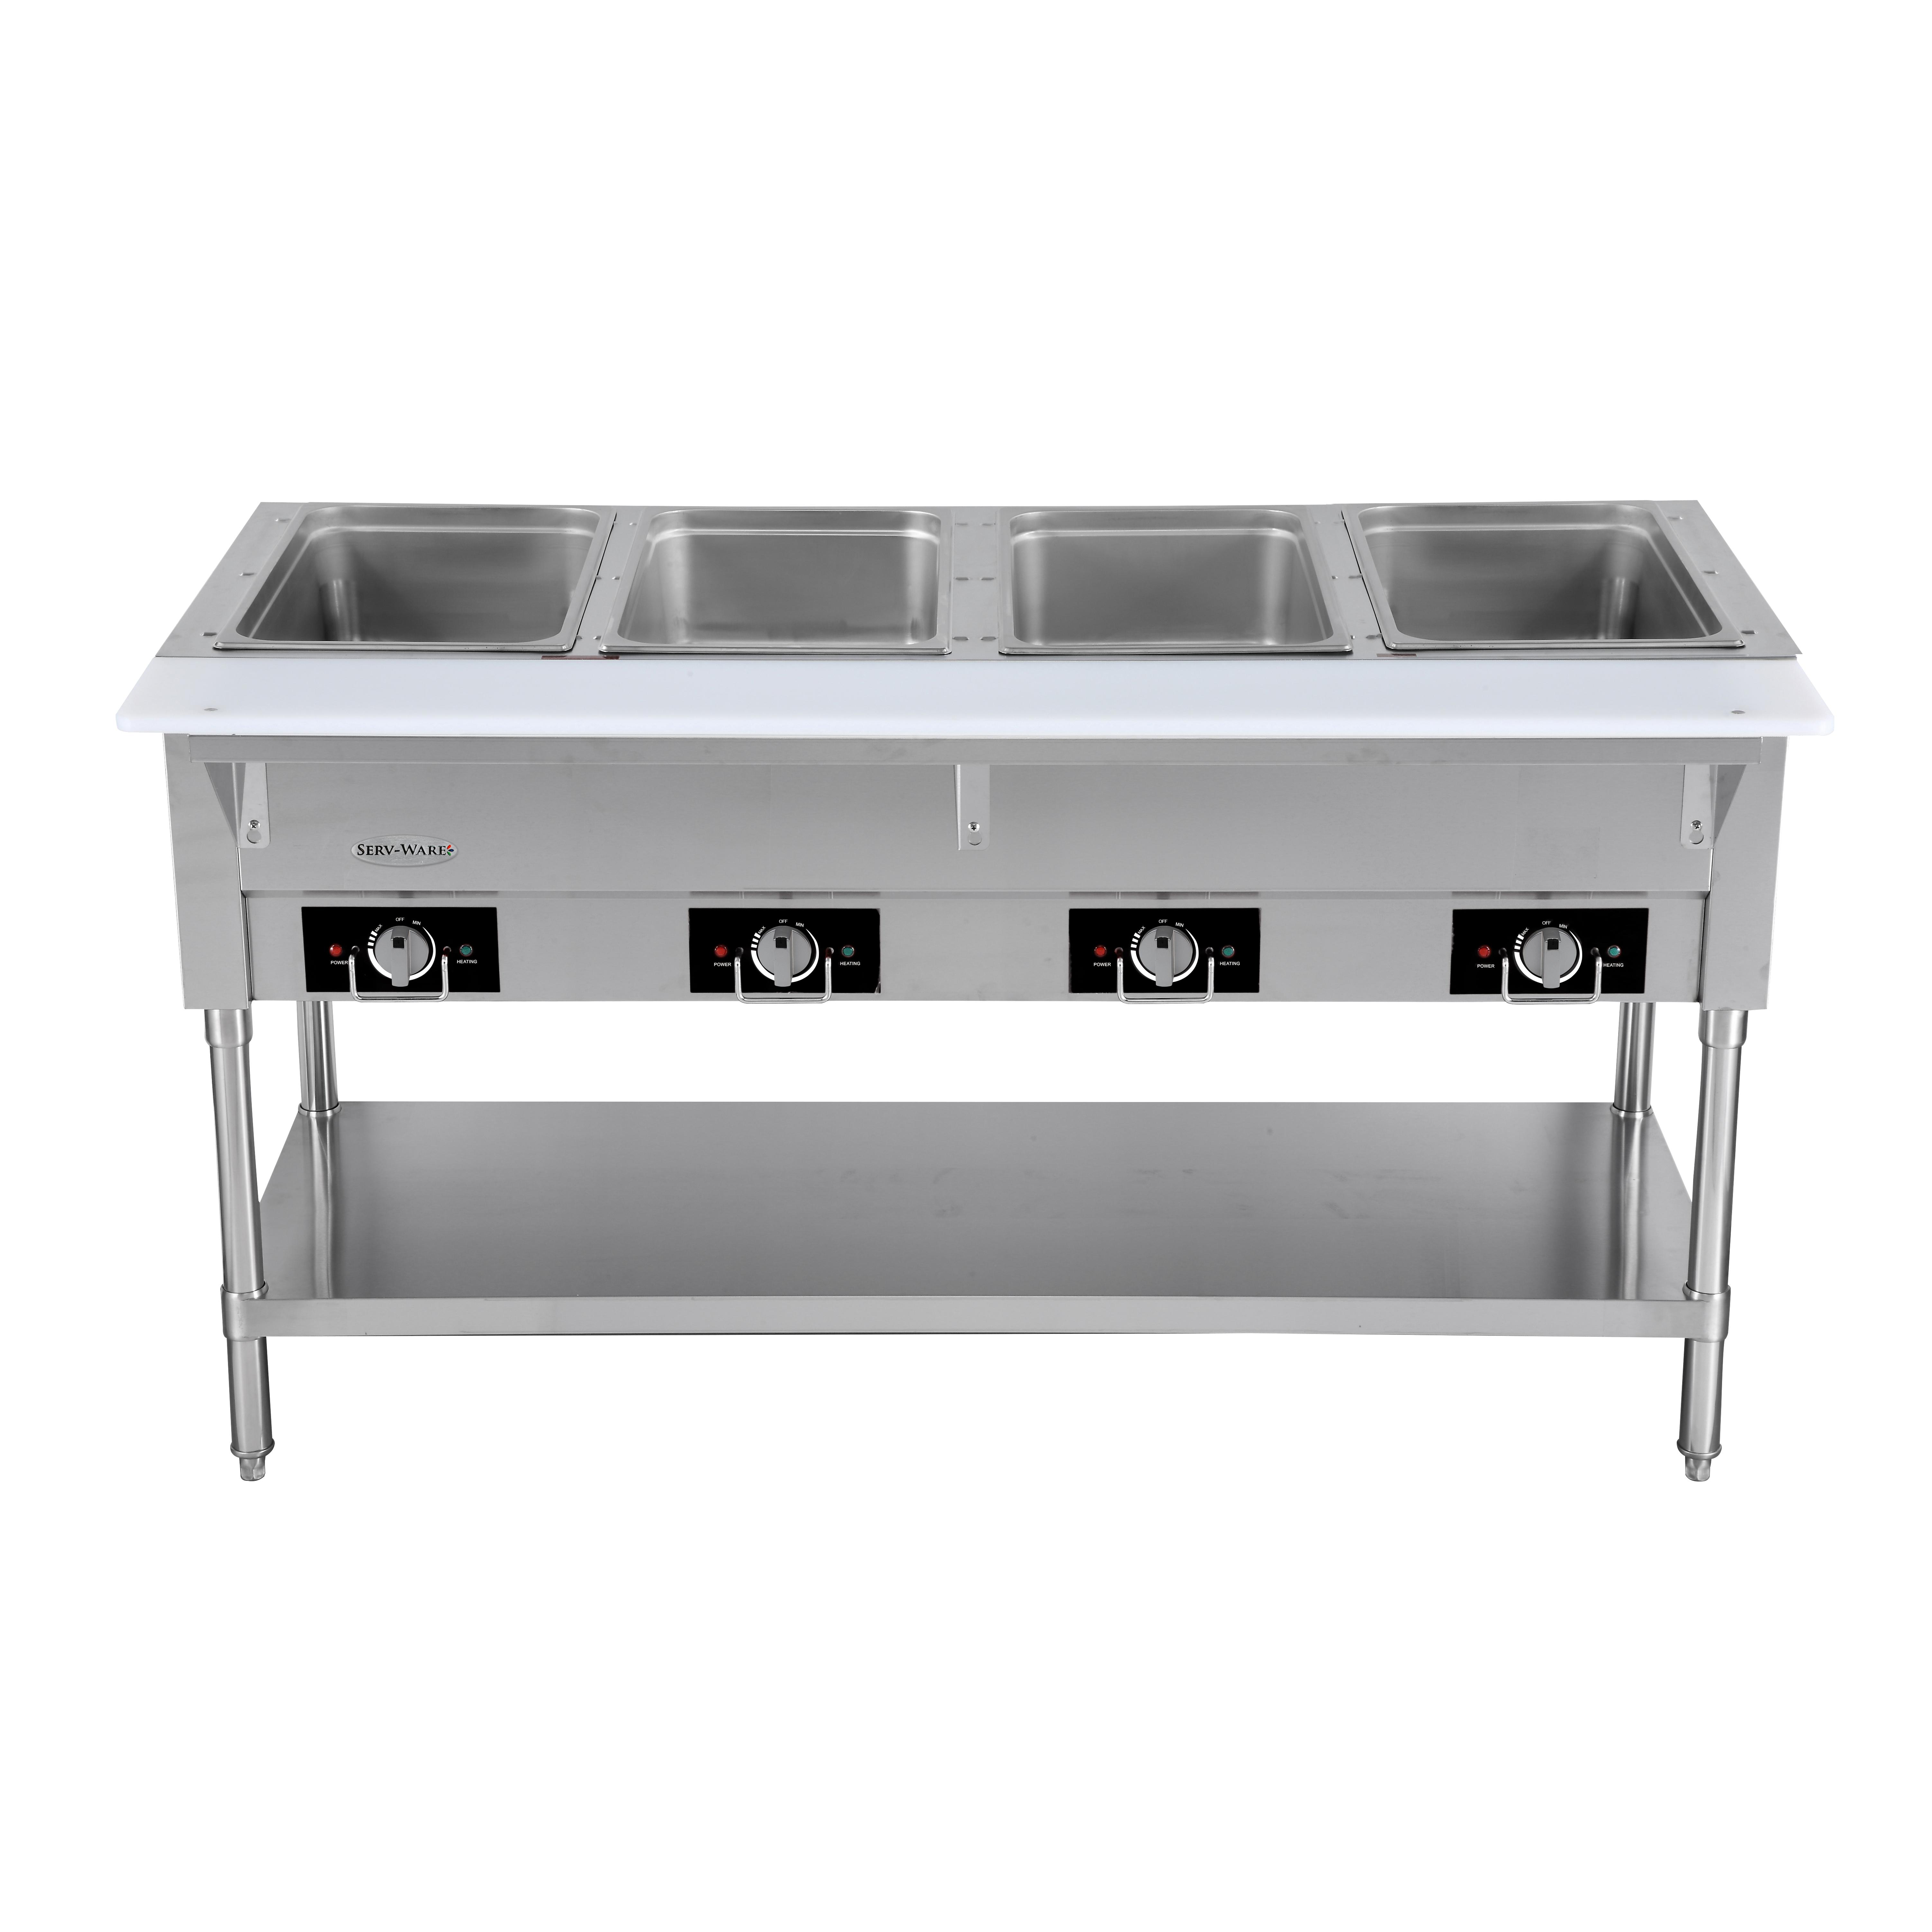 Serv-Ware EST4-1 serving counter, hot food, electric